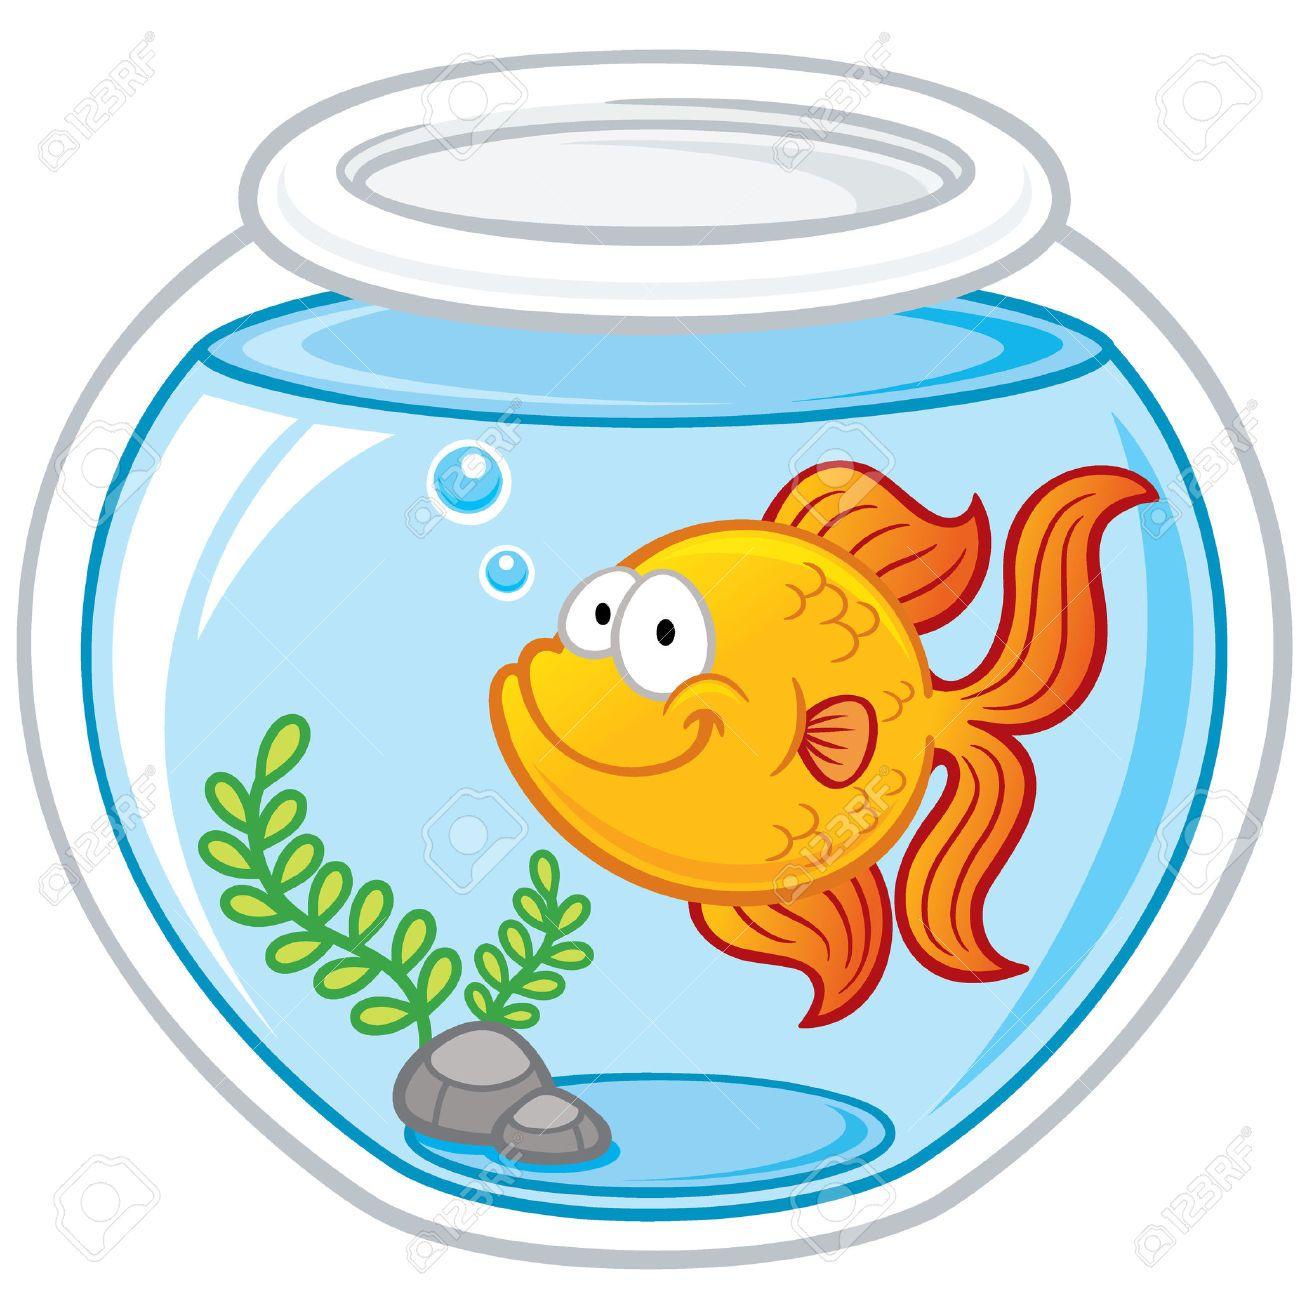 image black and white download Fish bowl tank goldfish. Fishbowl clipart fishing